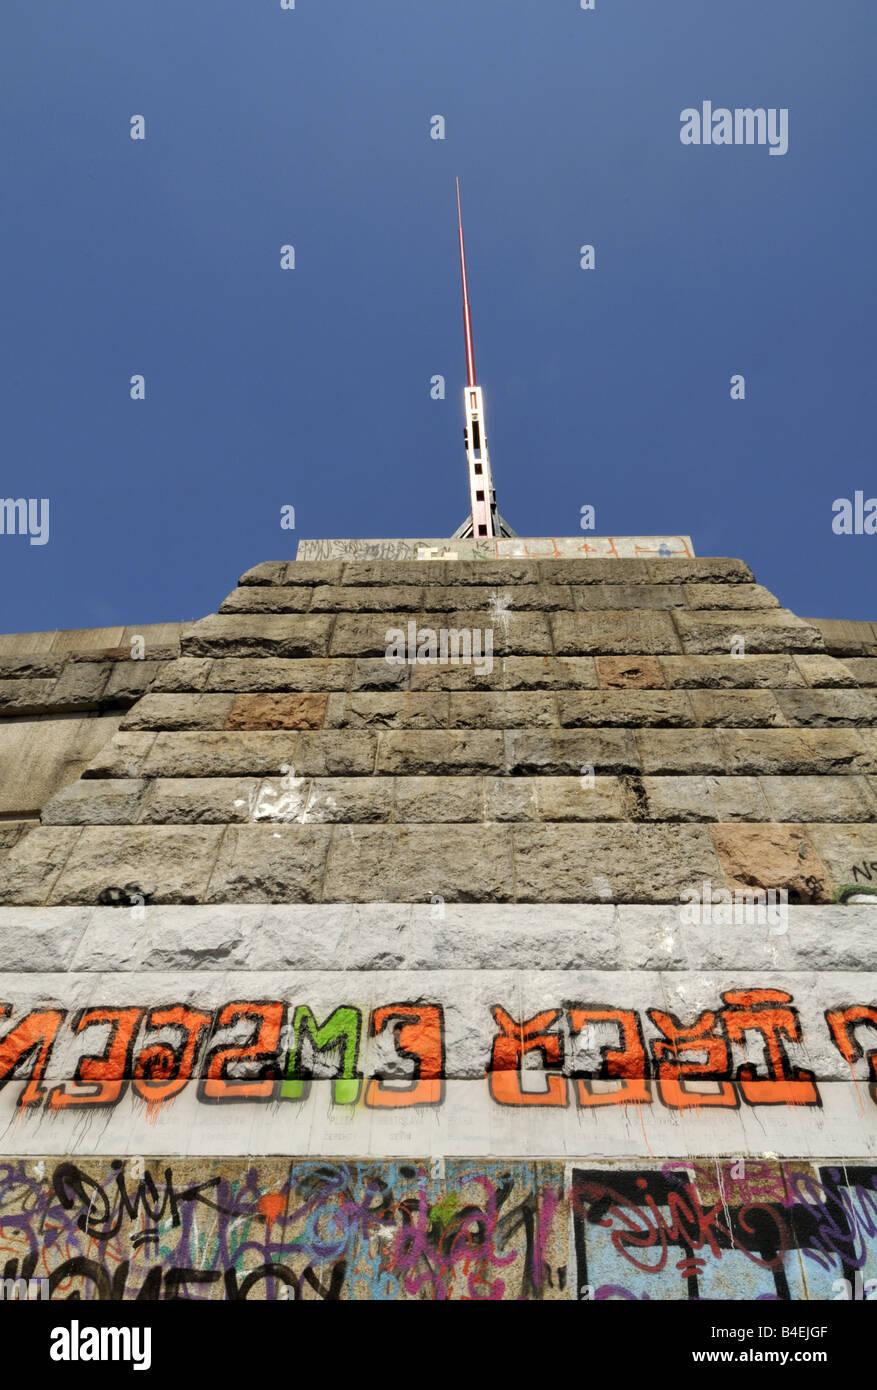 Graffiti and metronome sculpture at Letna Park, Prague, Czech Republic. Stock Photo